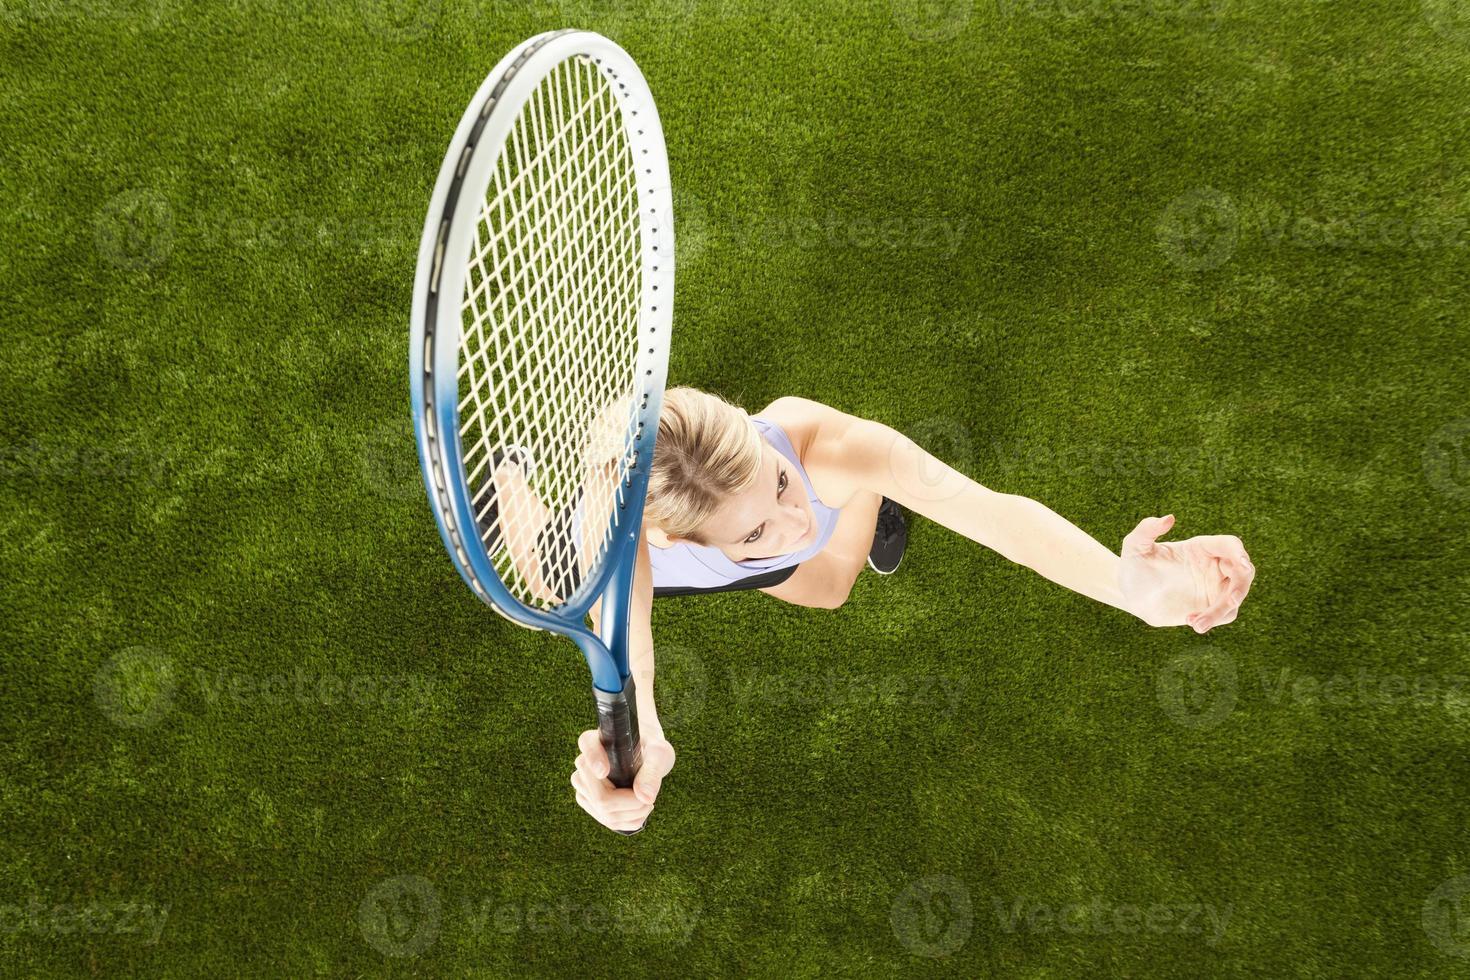 Tennis player on playground photo